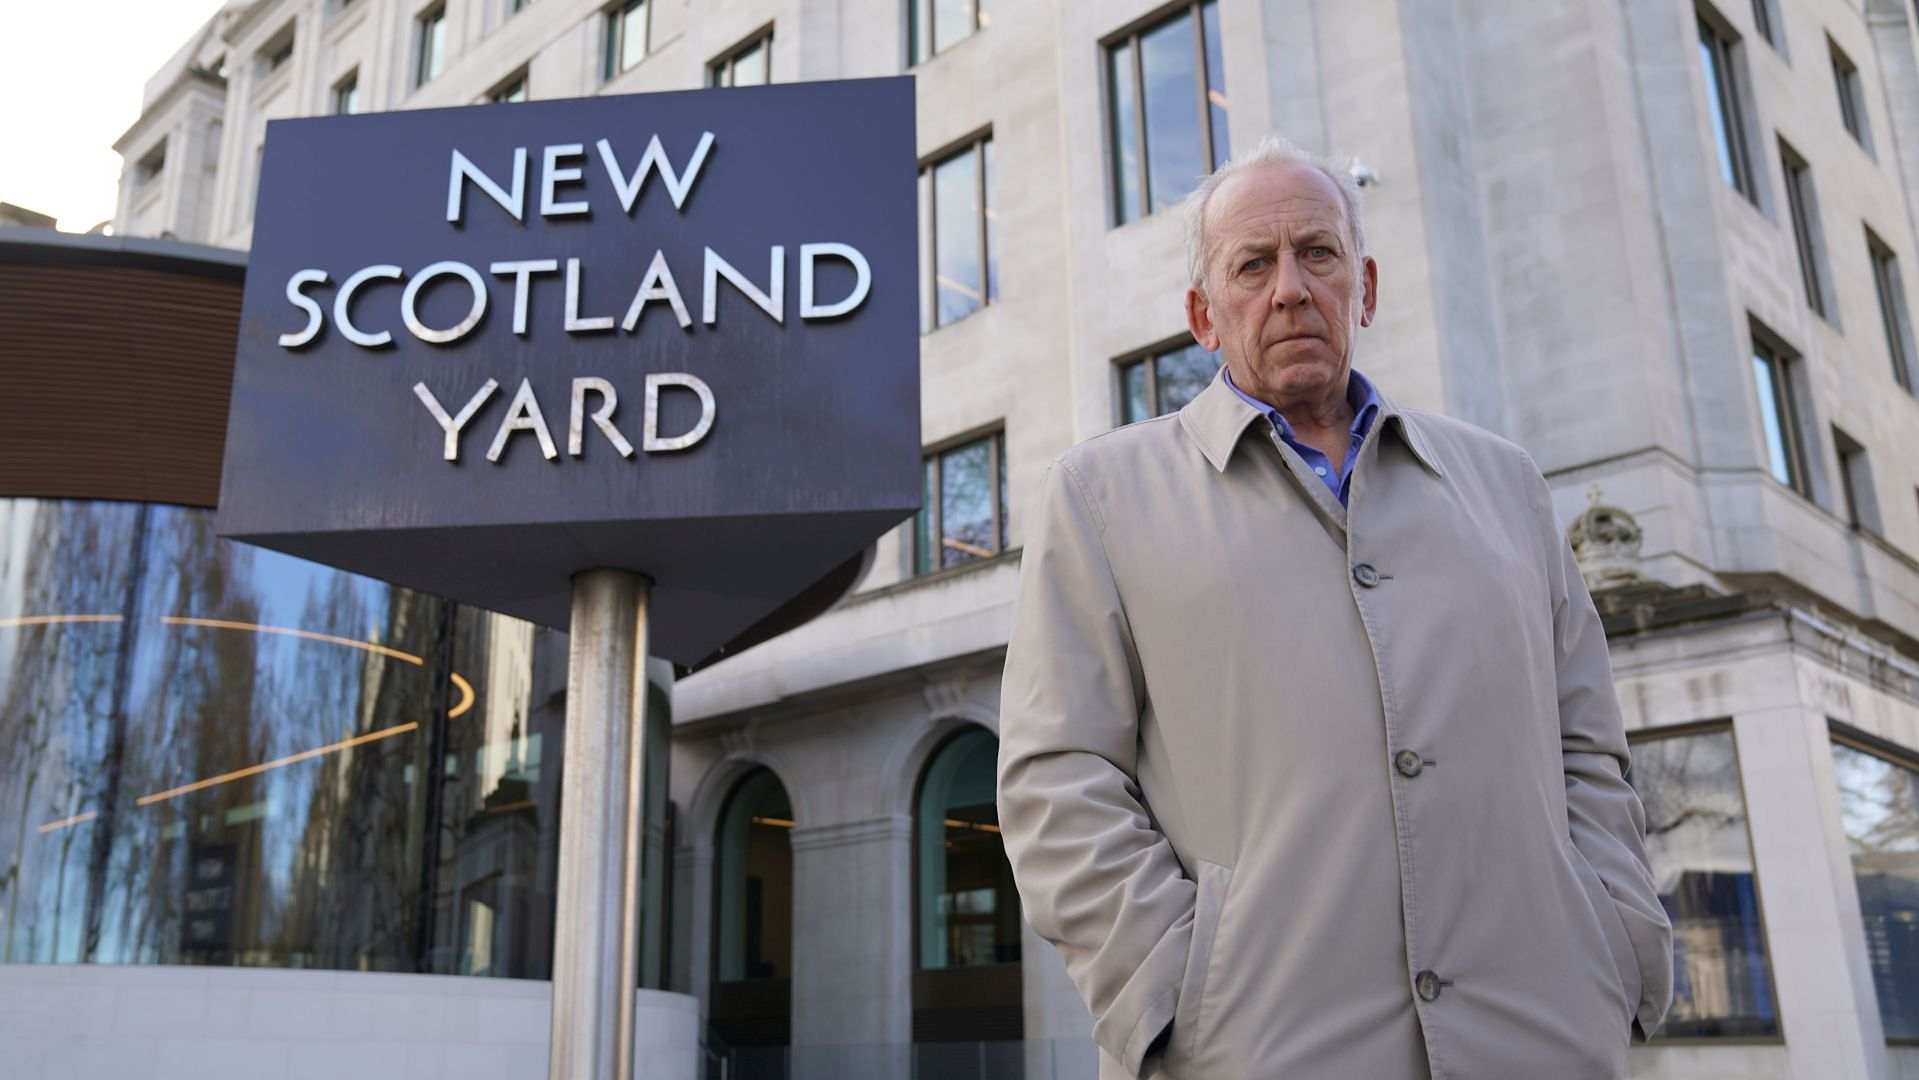 Bleksley - legenda Scotland Yardu